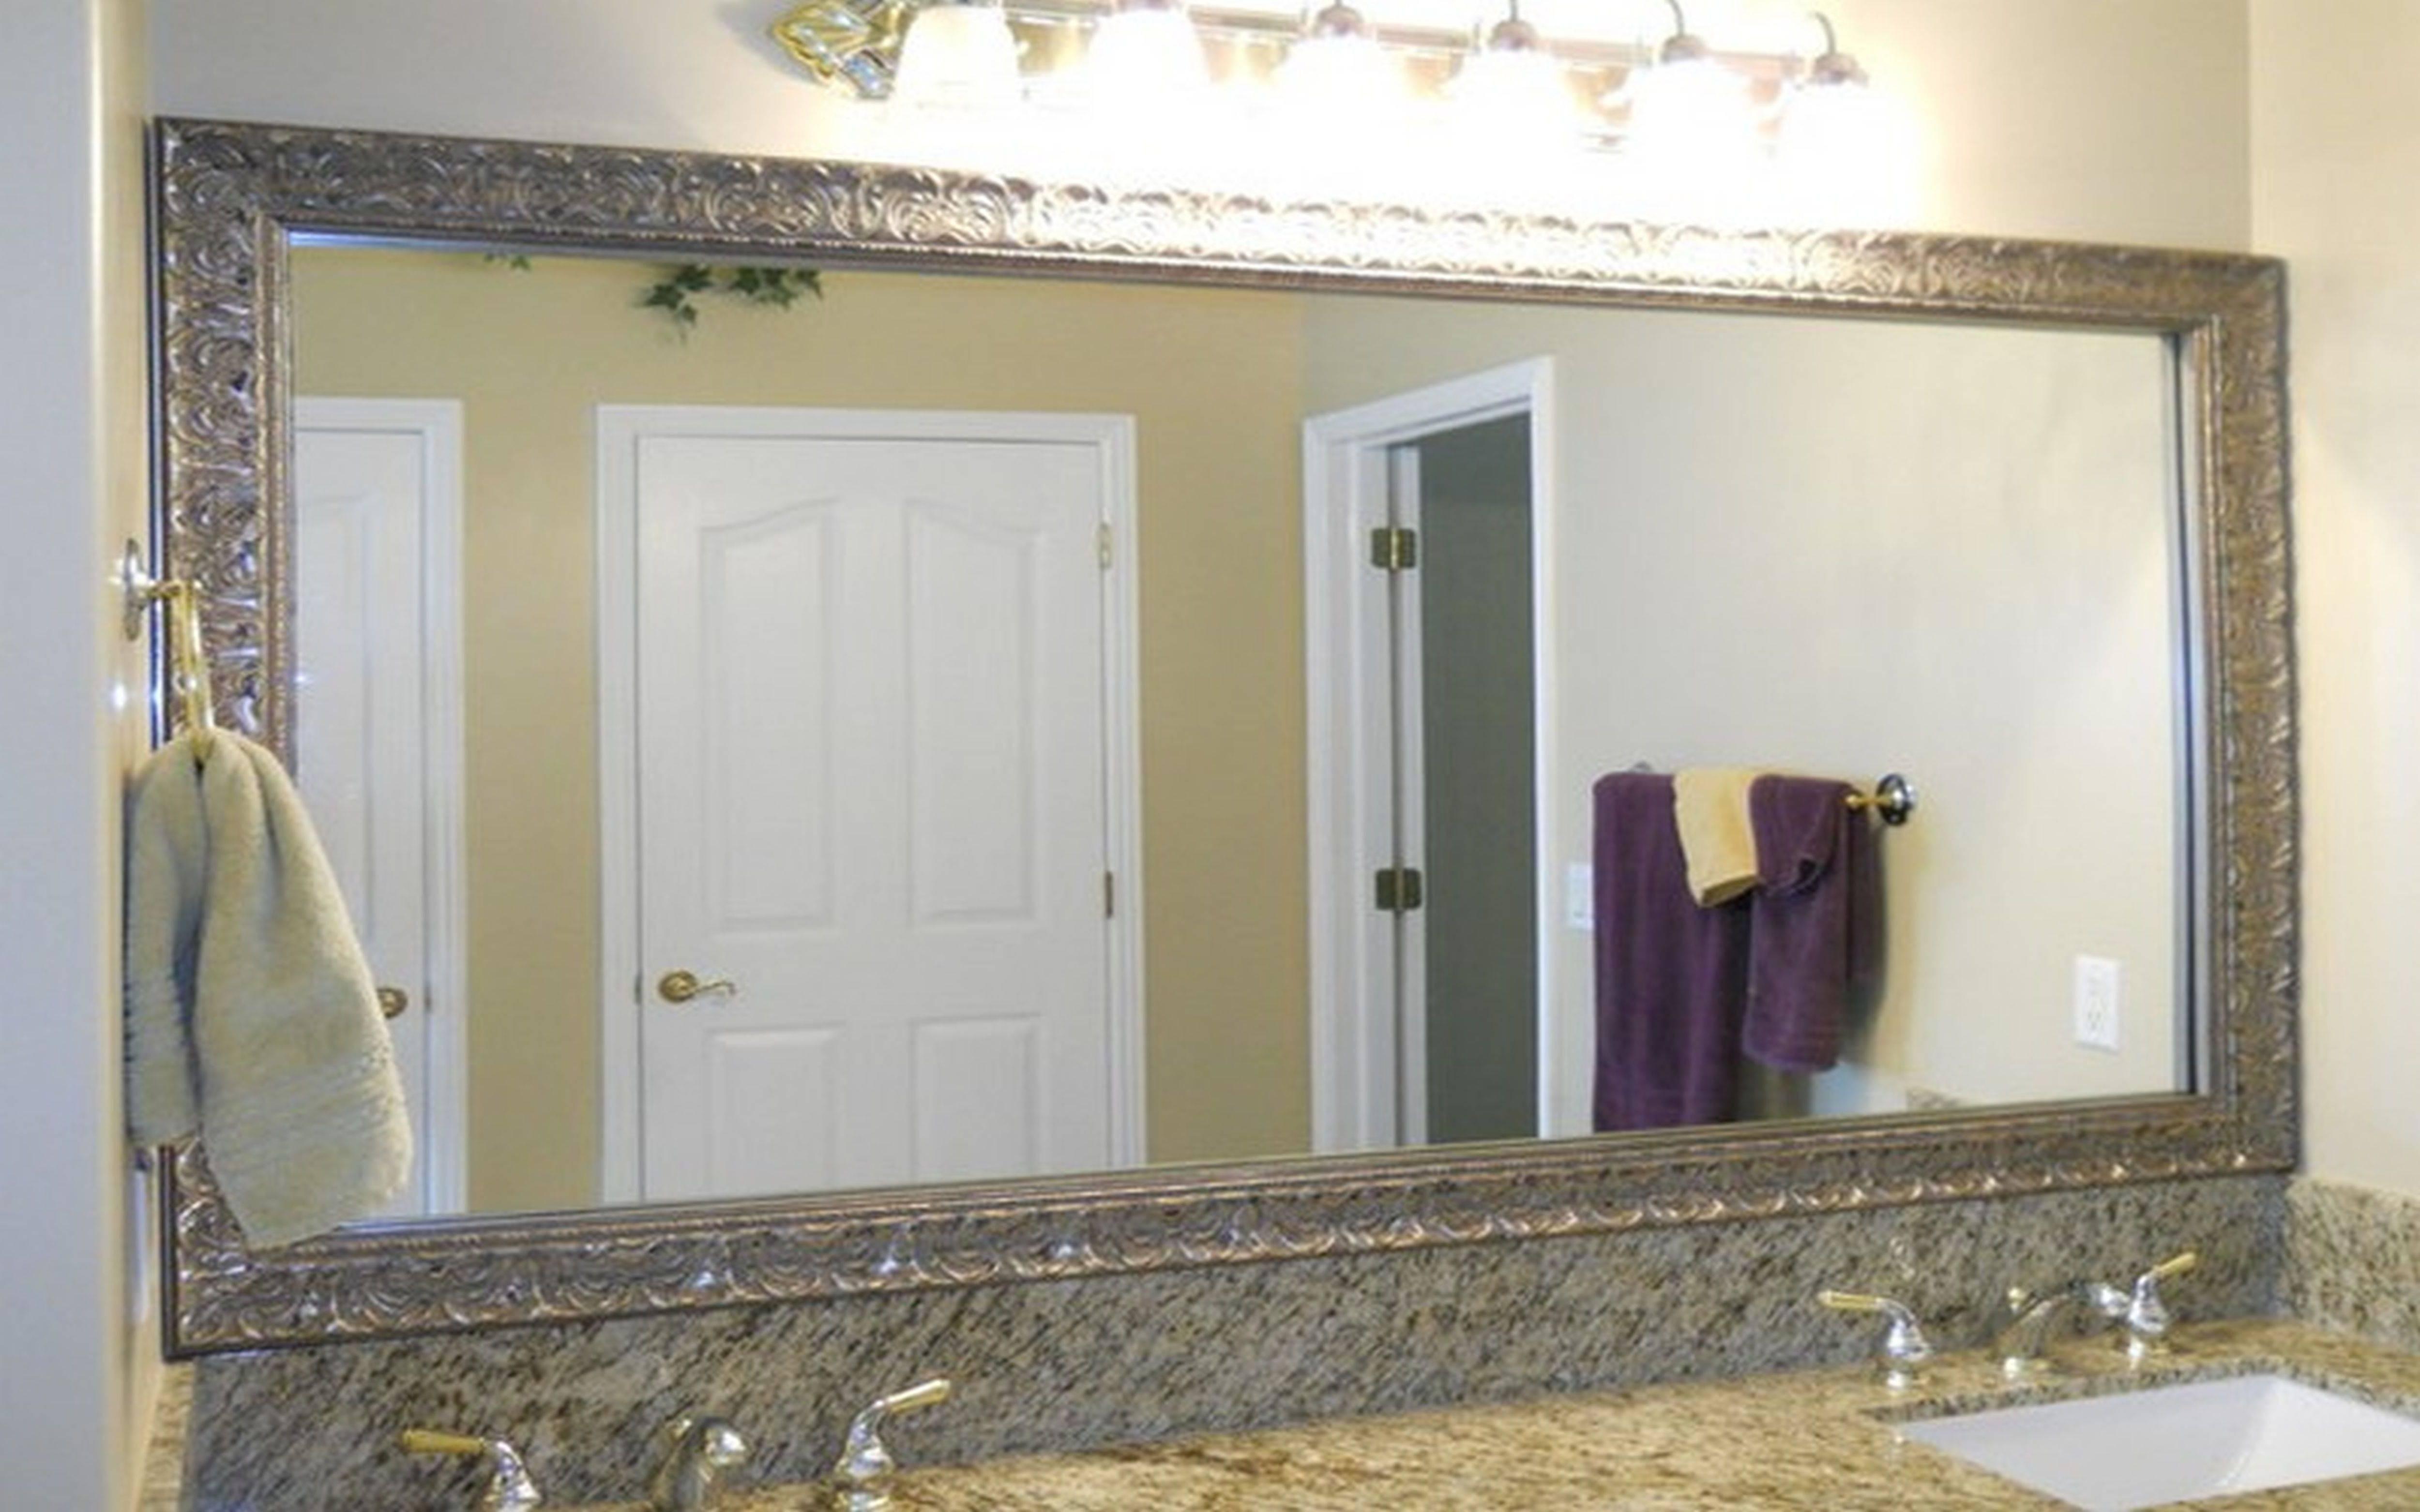 Bathroom : Furniture Bathroom Tilting Bathroom Mirror And Tile And regarding Cream Wall Mirrors (Image 2 of 25)